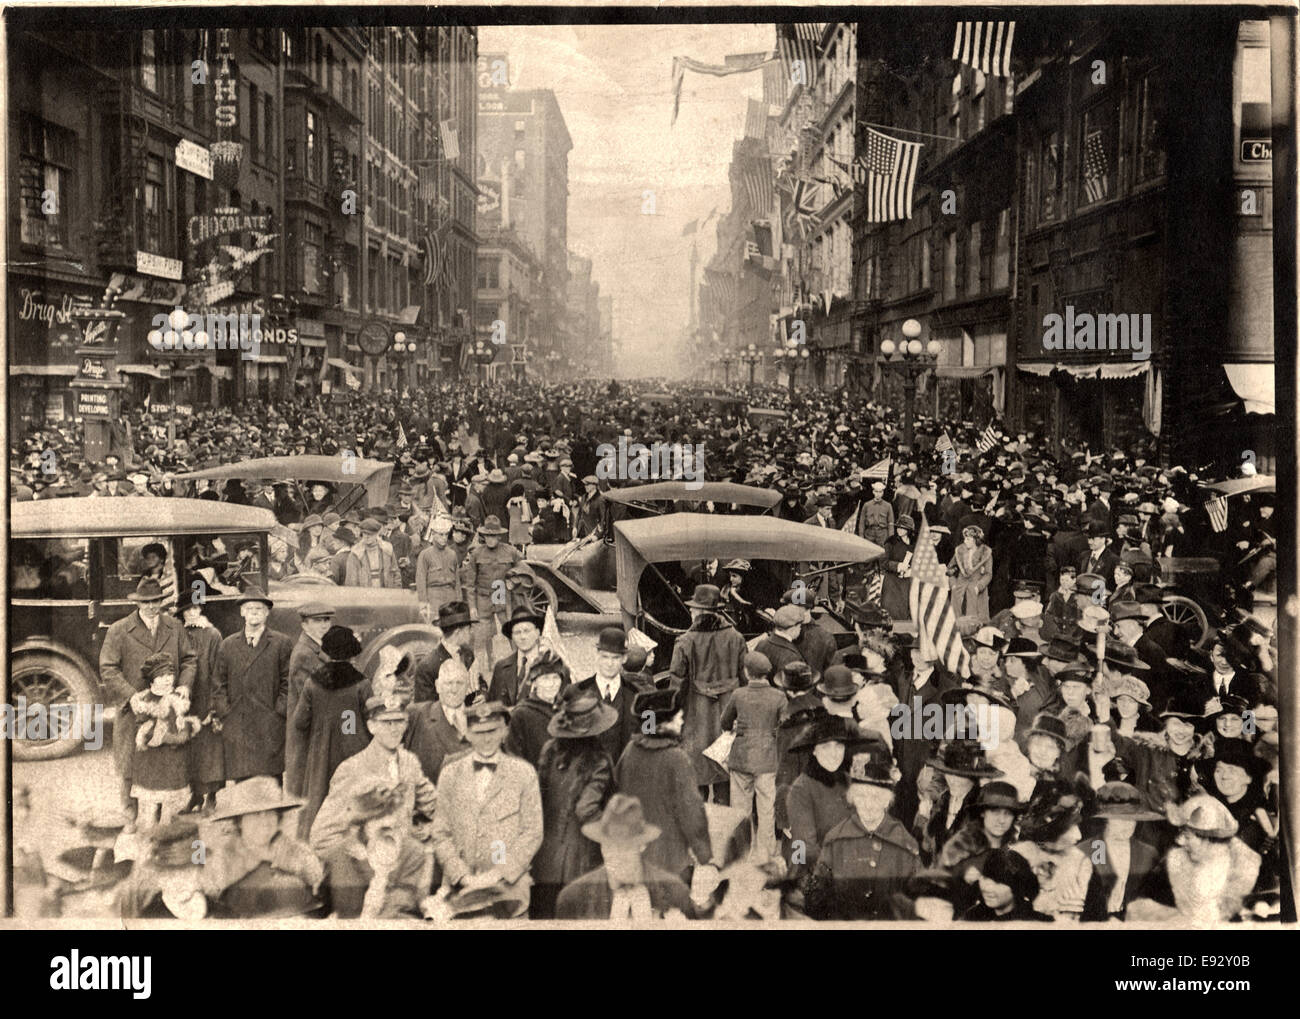 WWI Victory Celebration, New York City, USA, November 11, 1918 - Stock Image